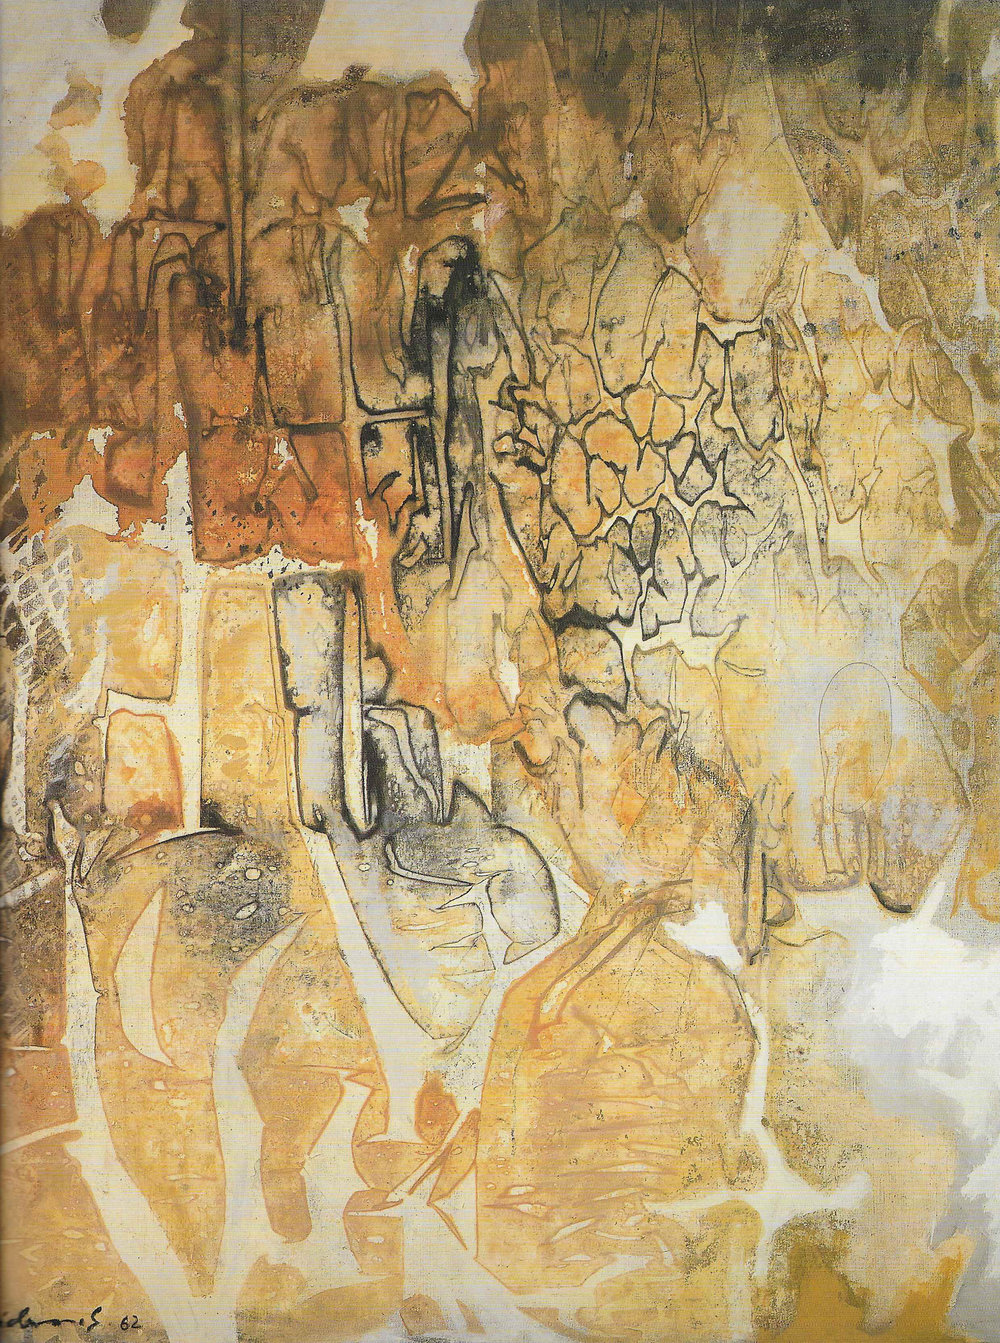 CARL HEIDENREICH, HERALDIK . 1962. OIL. COLLECTION OF EMANUEL L. WOLF